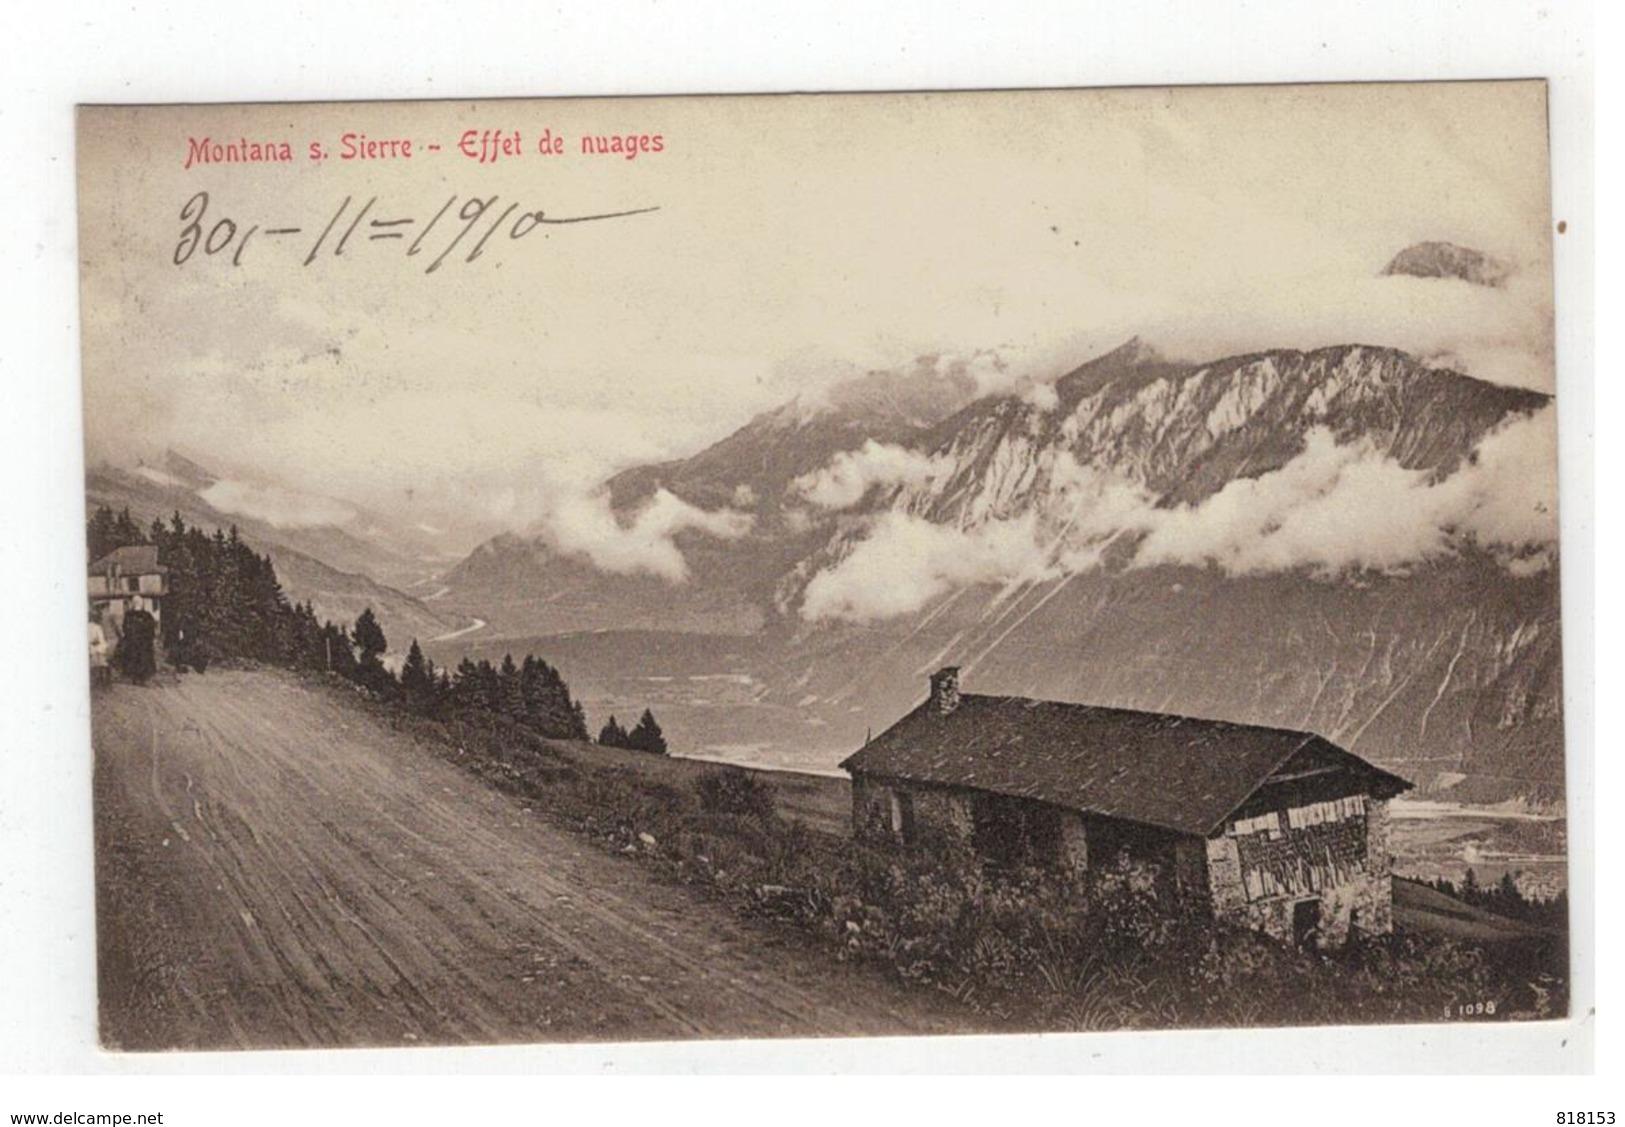 Montana S. Sierre  -  Effet De Nuages 1910 - Switzerland